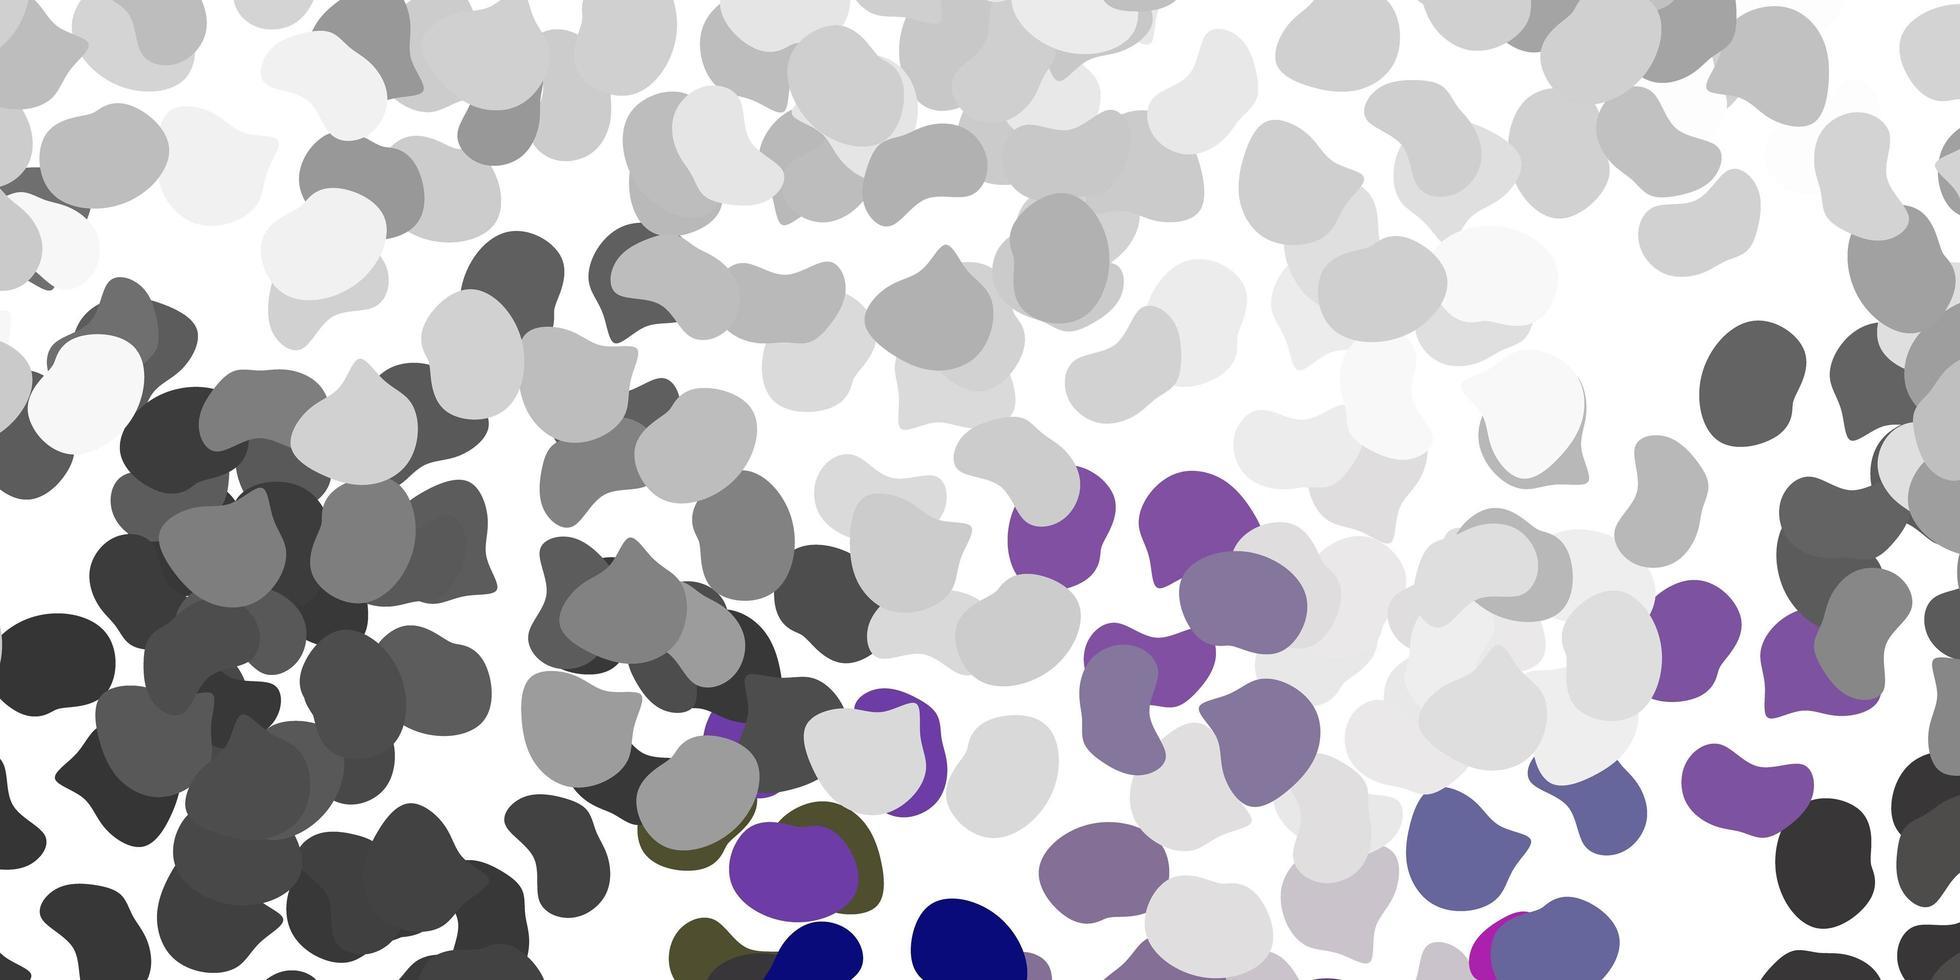 textura vetorial cinza claro com formas de memphis vetor